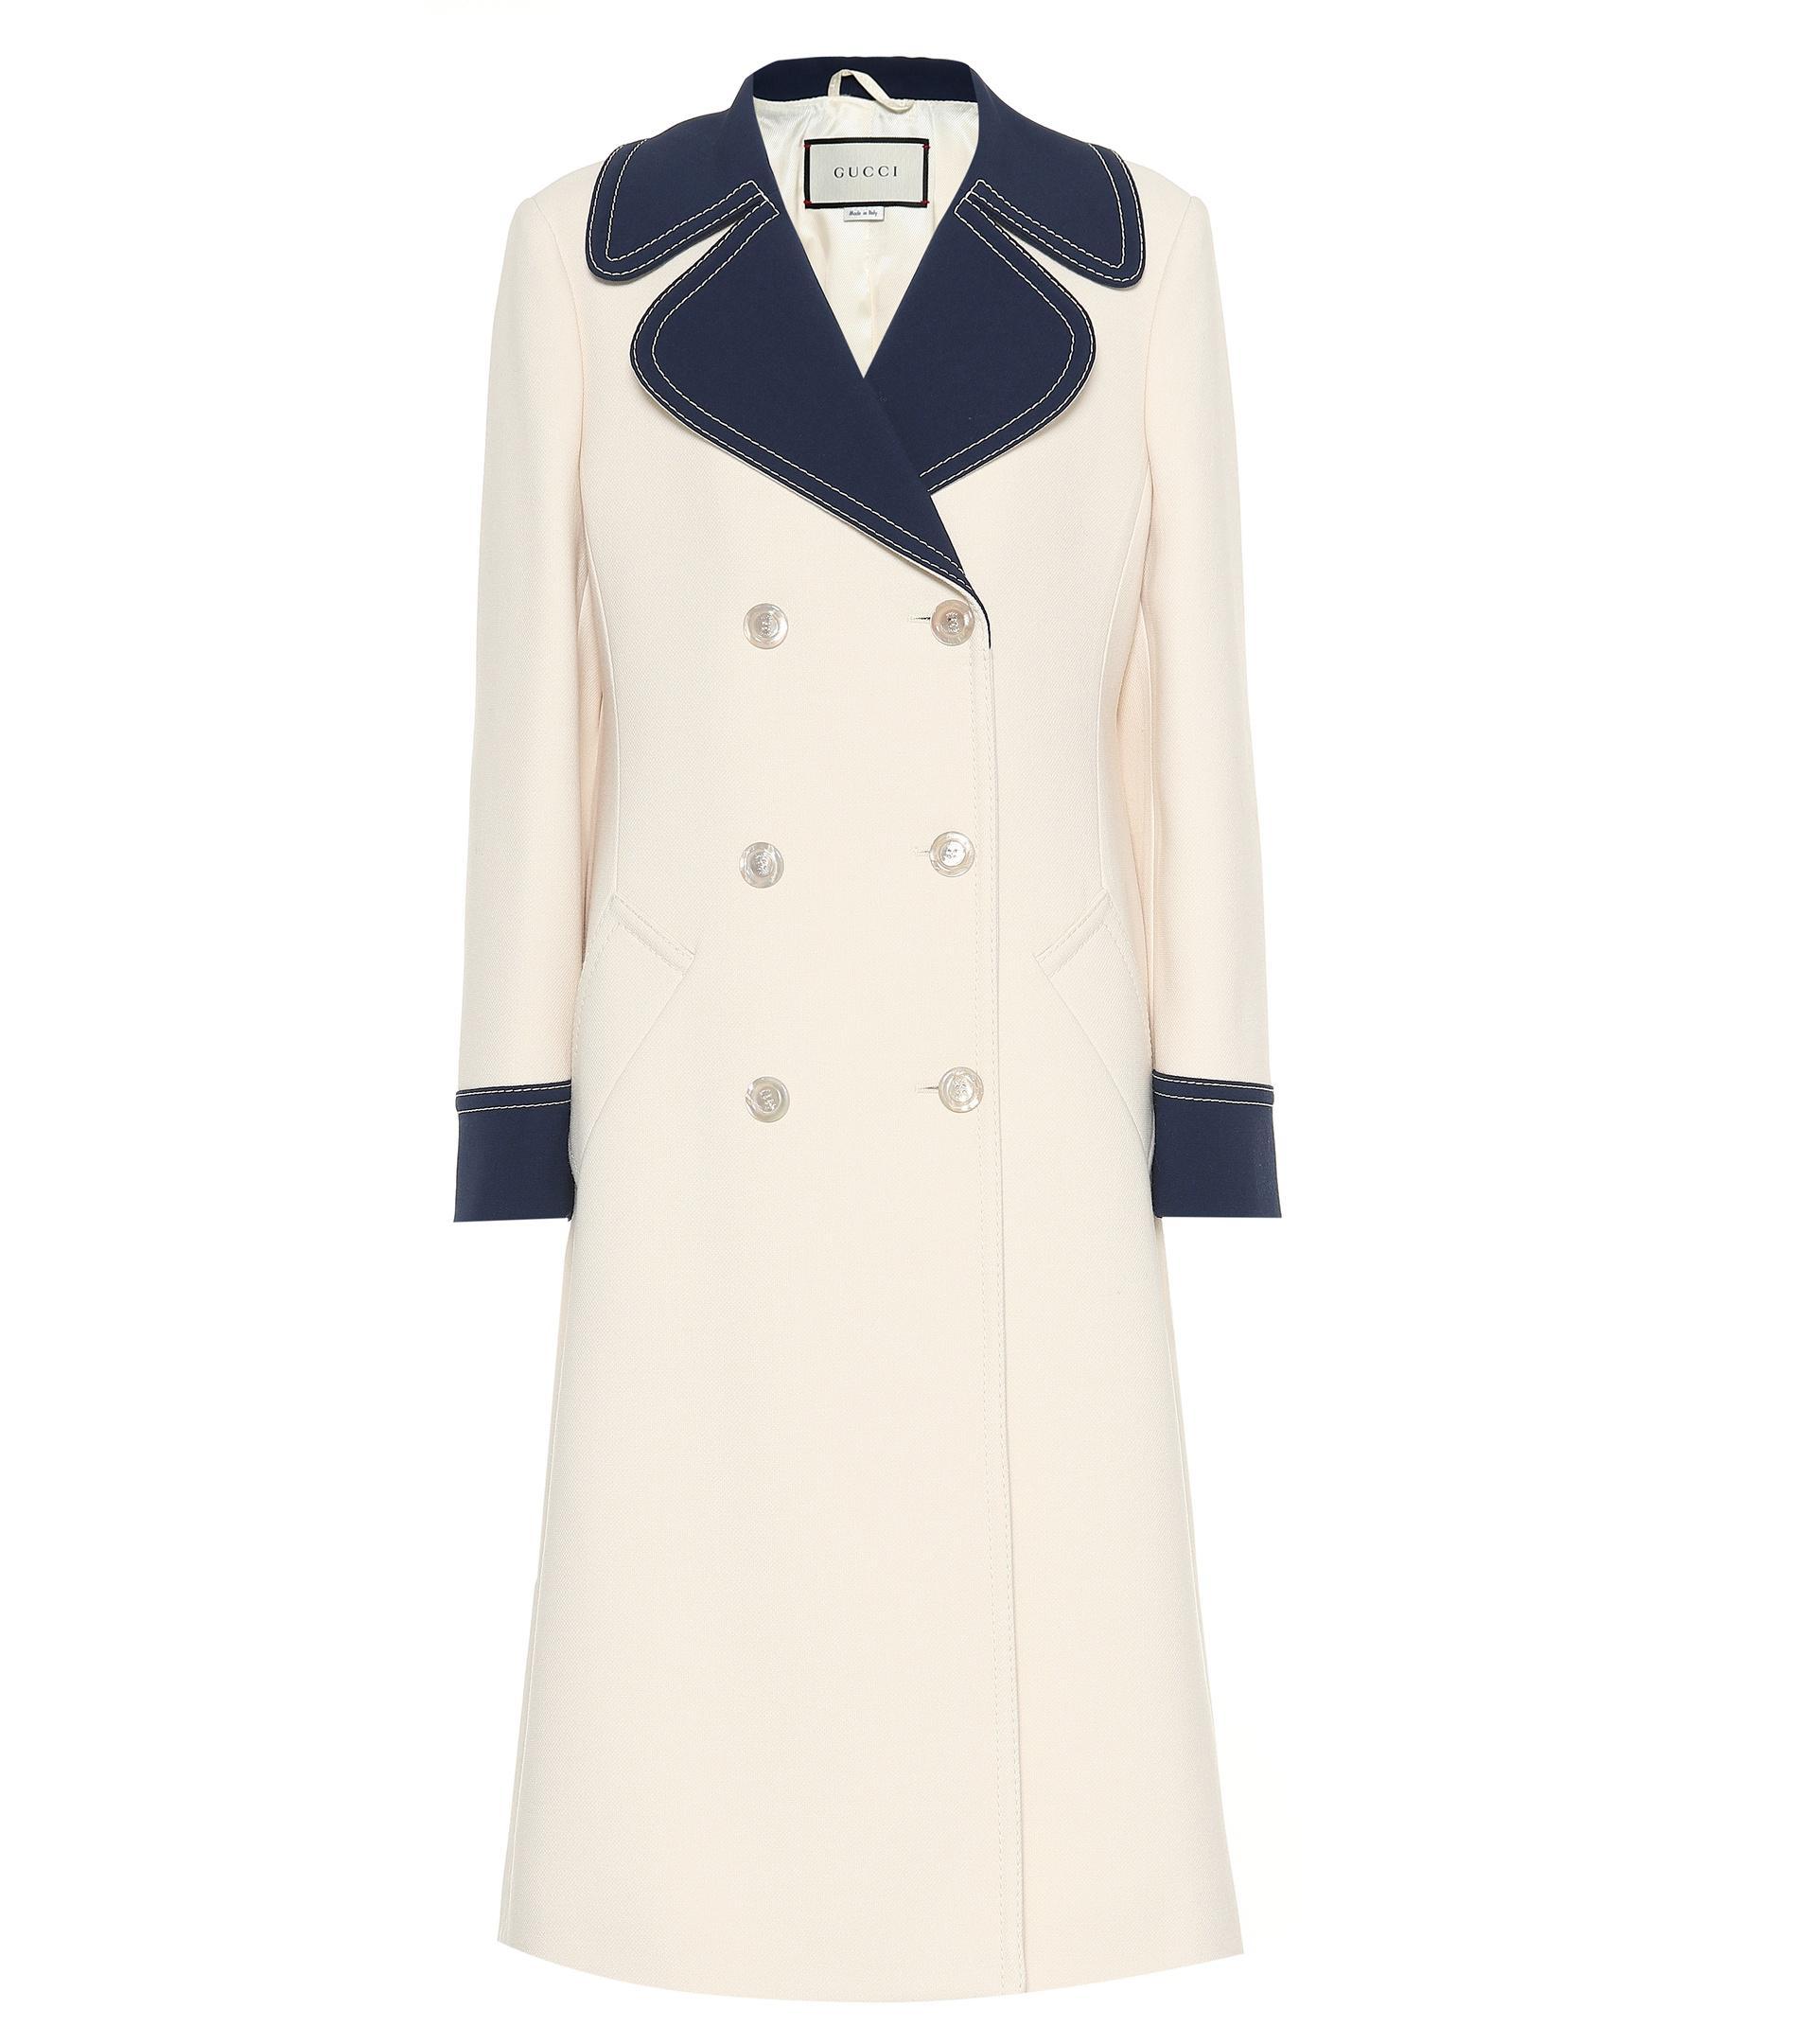 086b911d1b Women's White Double-breasted Wool Coat